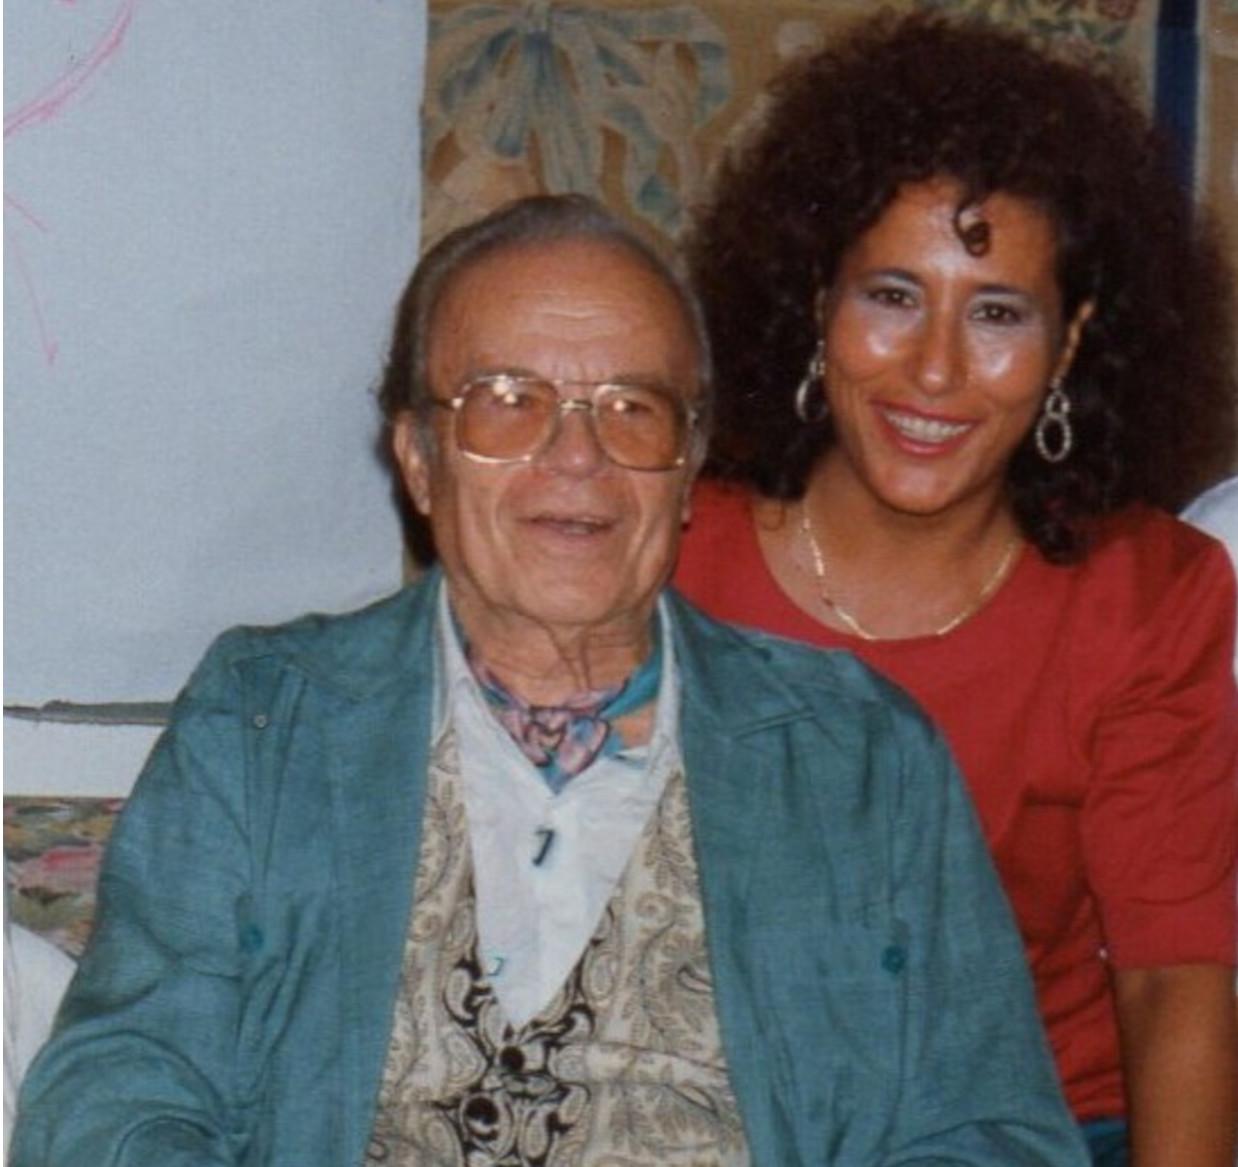 Luglio 1999 - J. Pierrakos e M. Introna